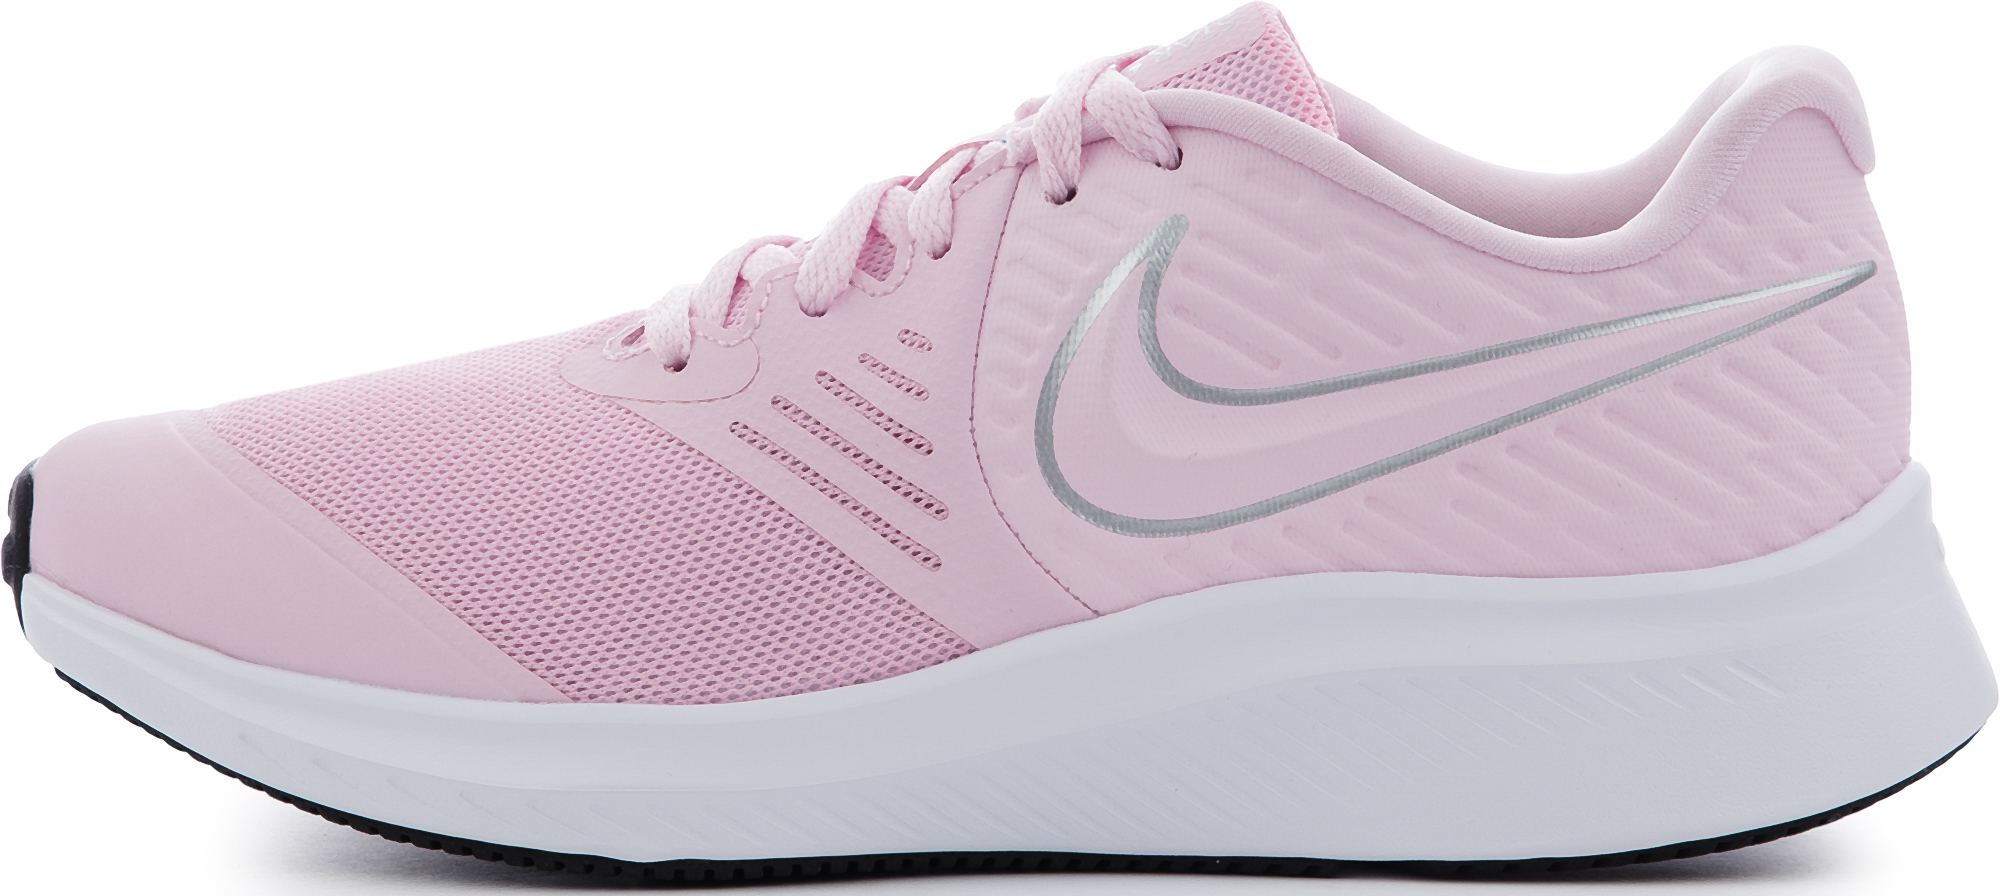 Nike Кроссовки для девочек Nike Star Runner 2 (Gs), размер 35,5